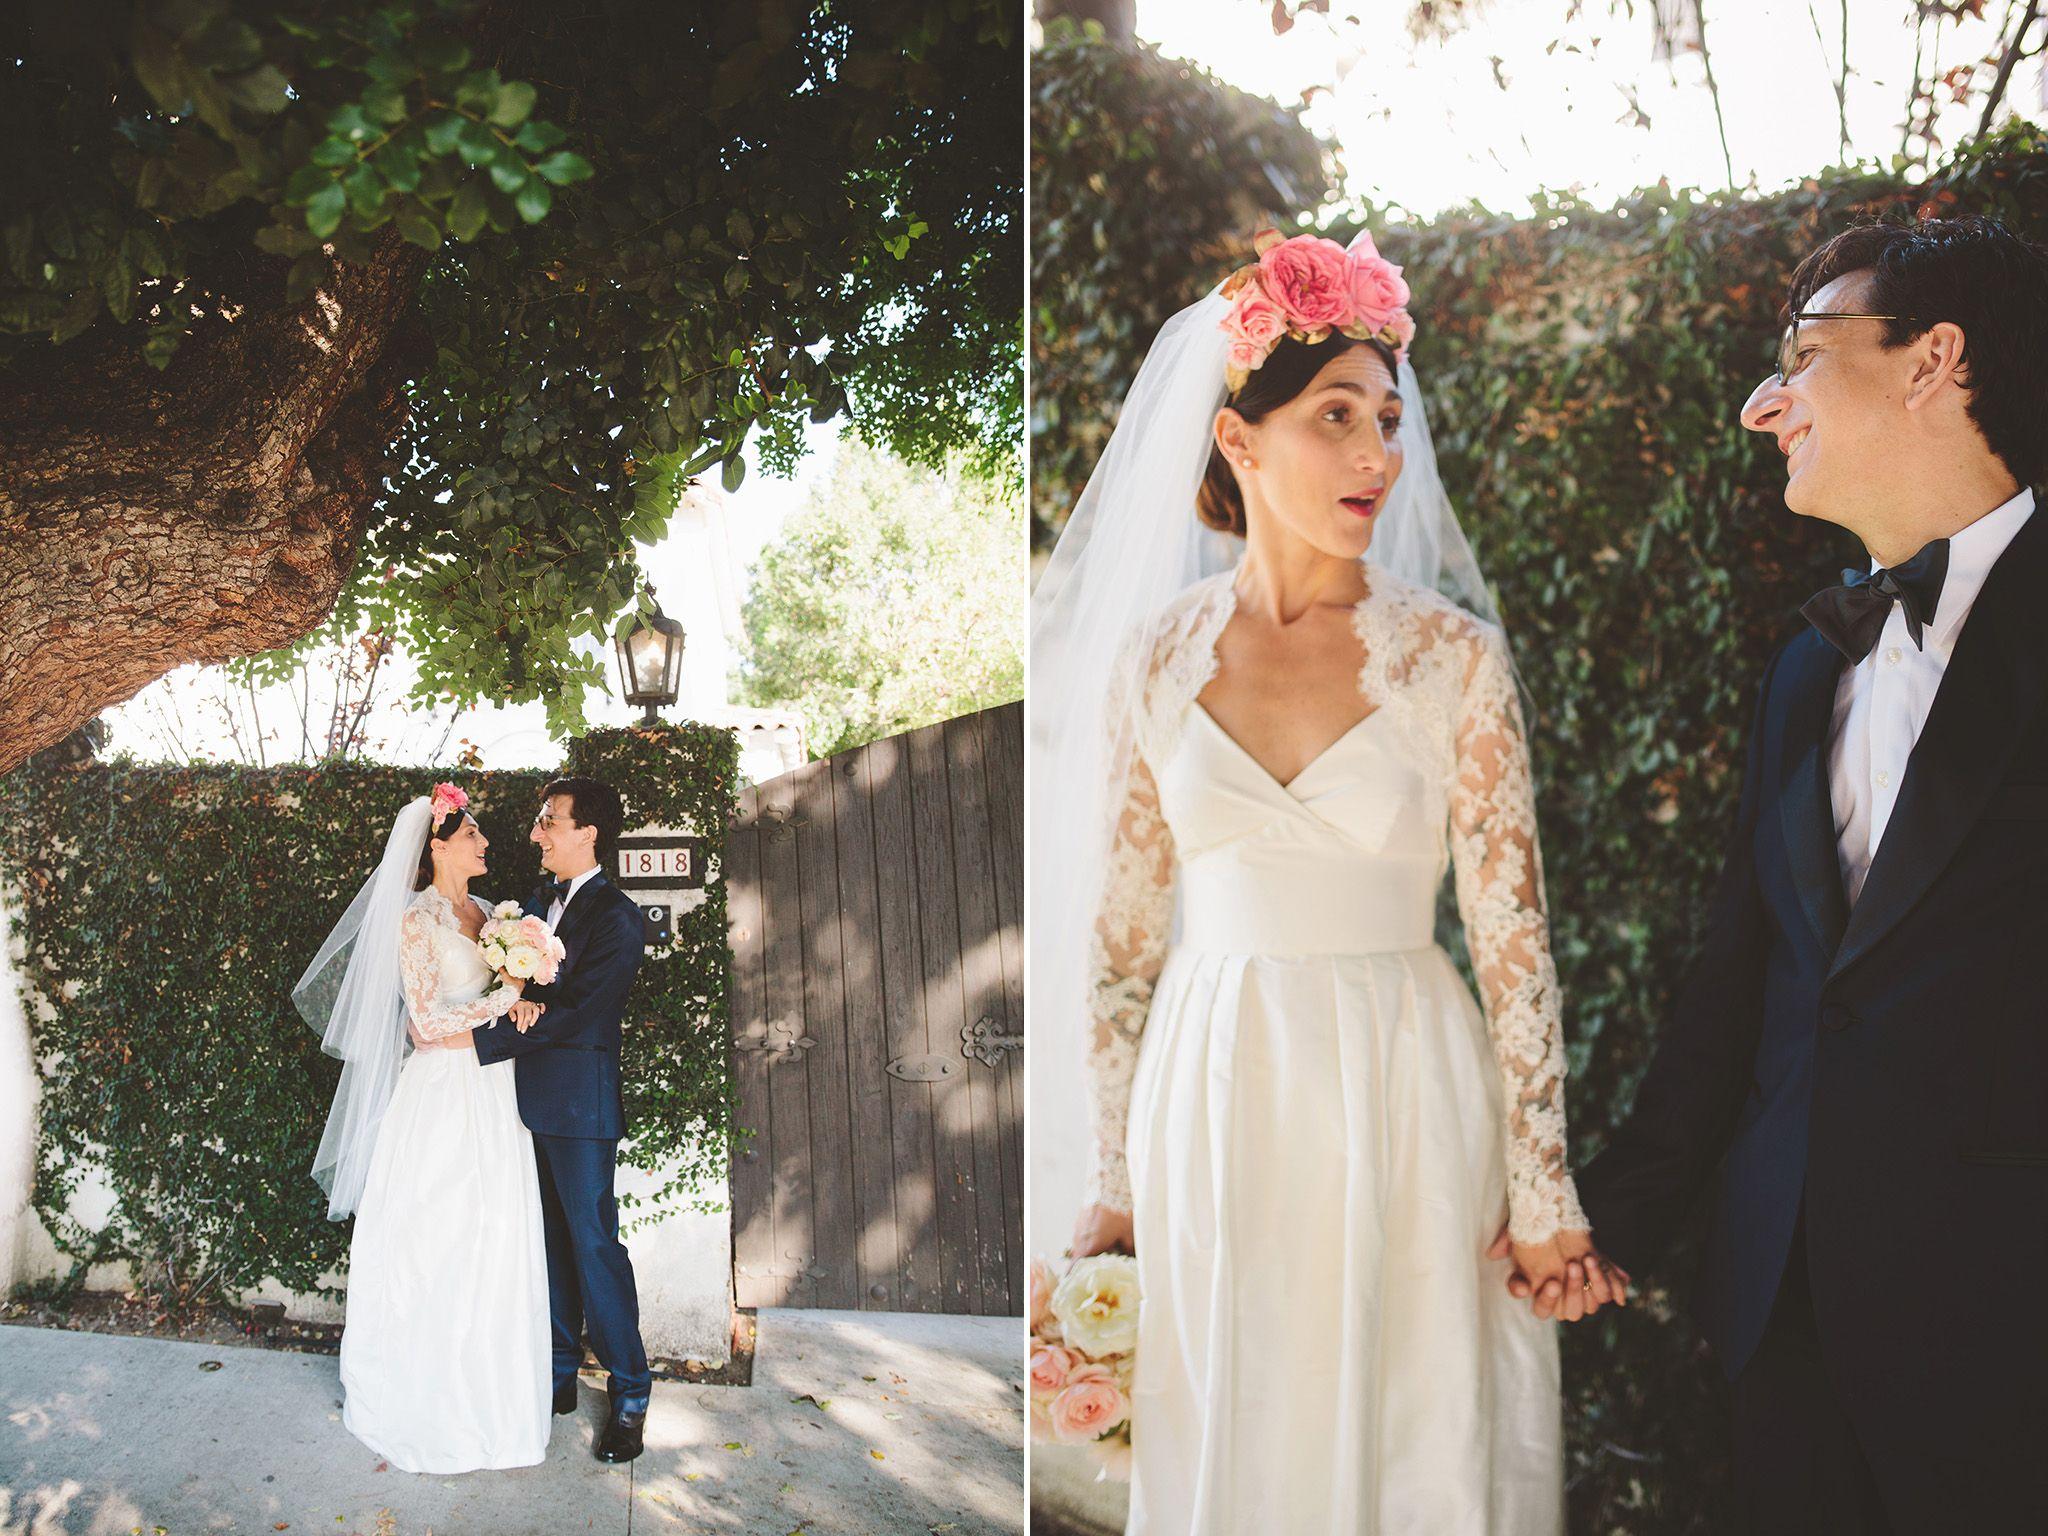 eclectic hollywood wedding lesley arfin paul rust